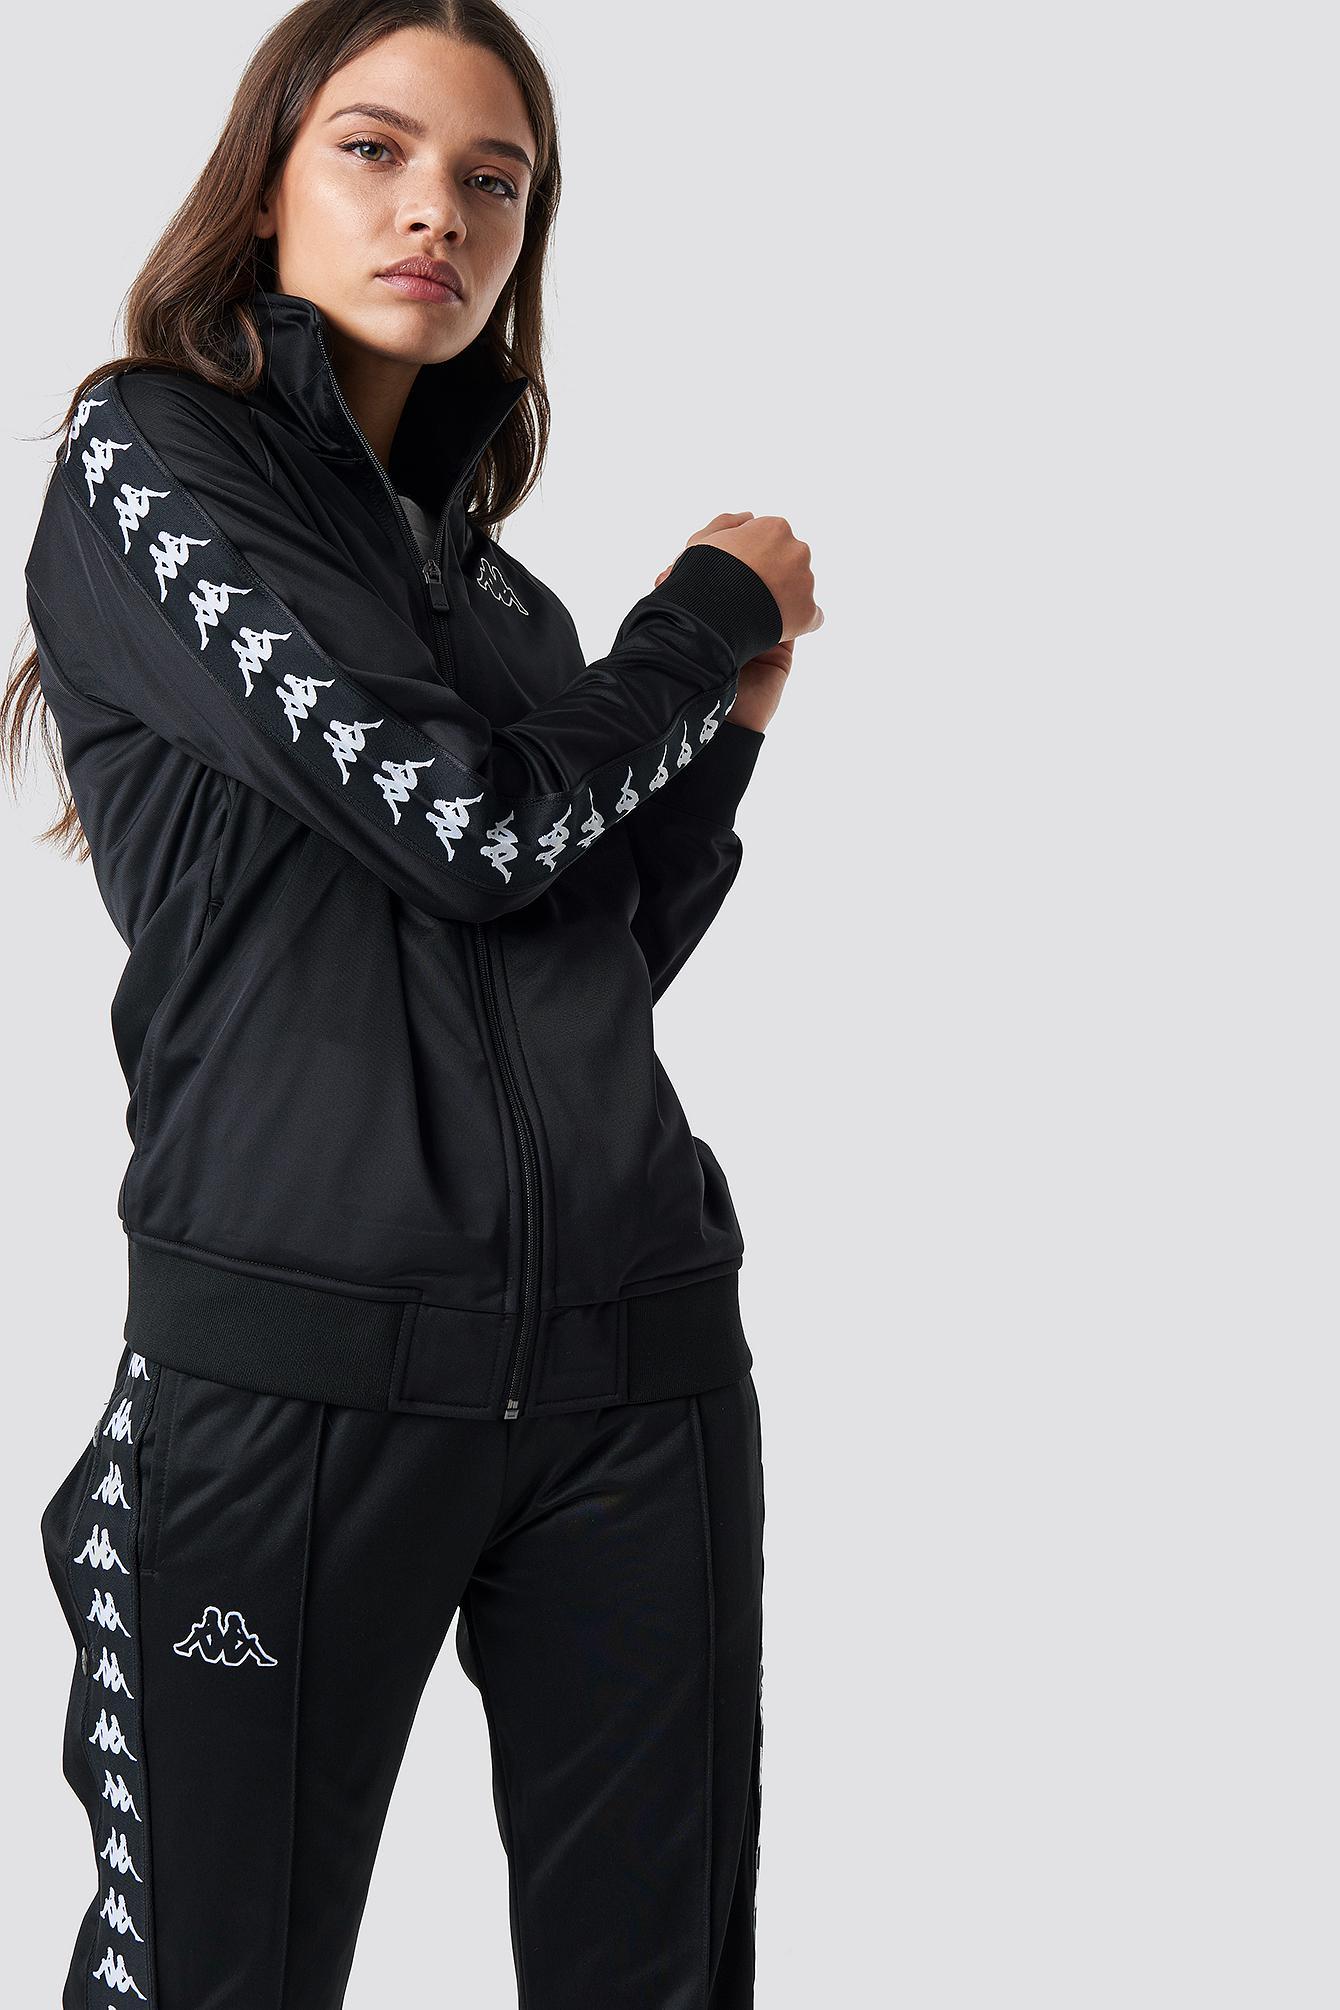 6688f808c27d Lyst - Kappa Anniston Track Jacket Black white in Black